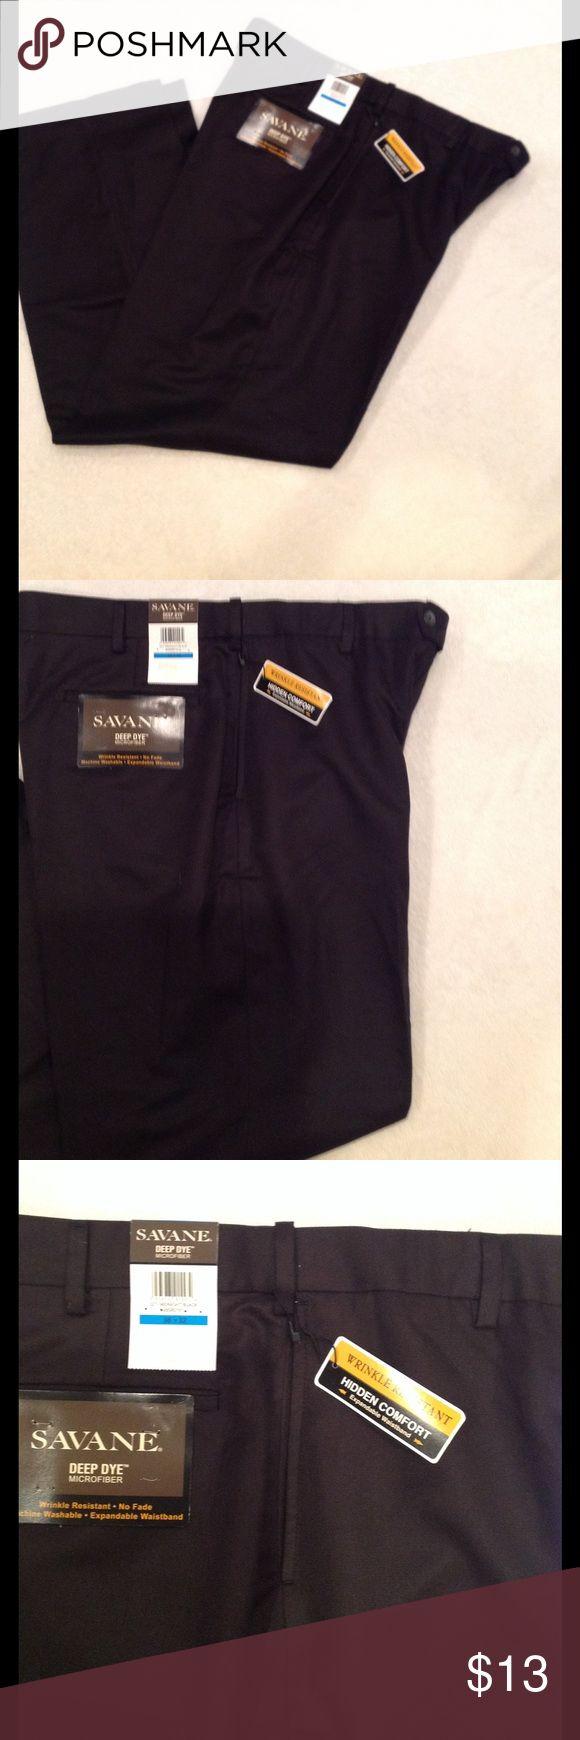 Men's Dress Pants Size 36x32, color is black, wrinkle resistant, no fade, hidden comfort with expandable waistband. Savane Pants Dress